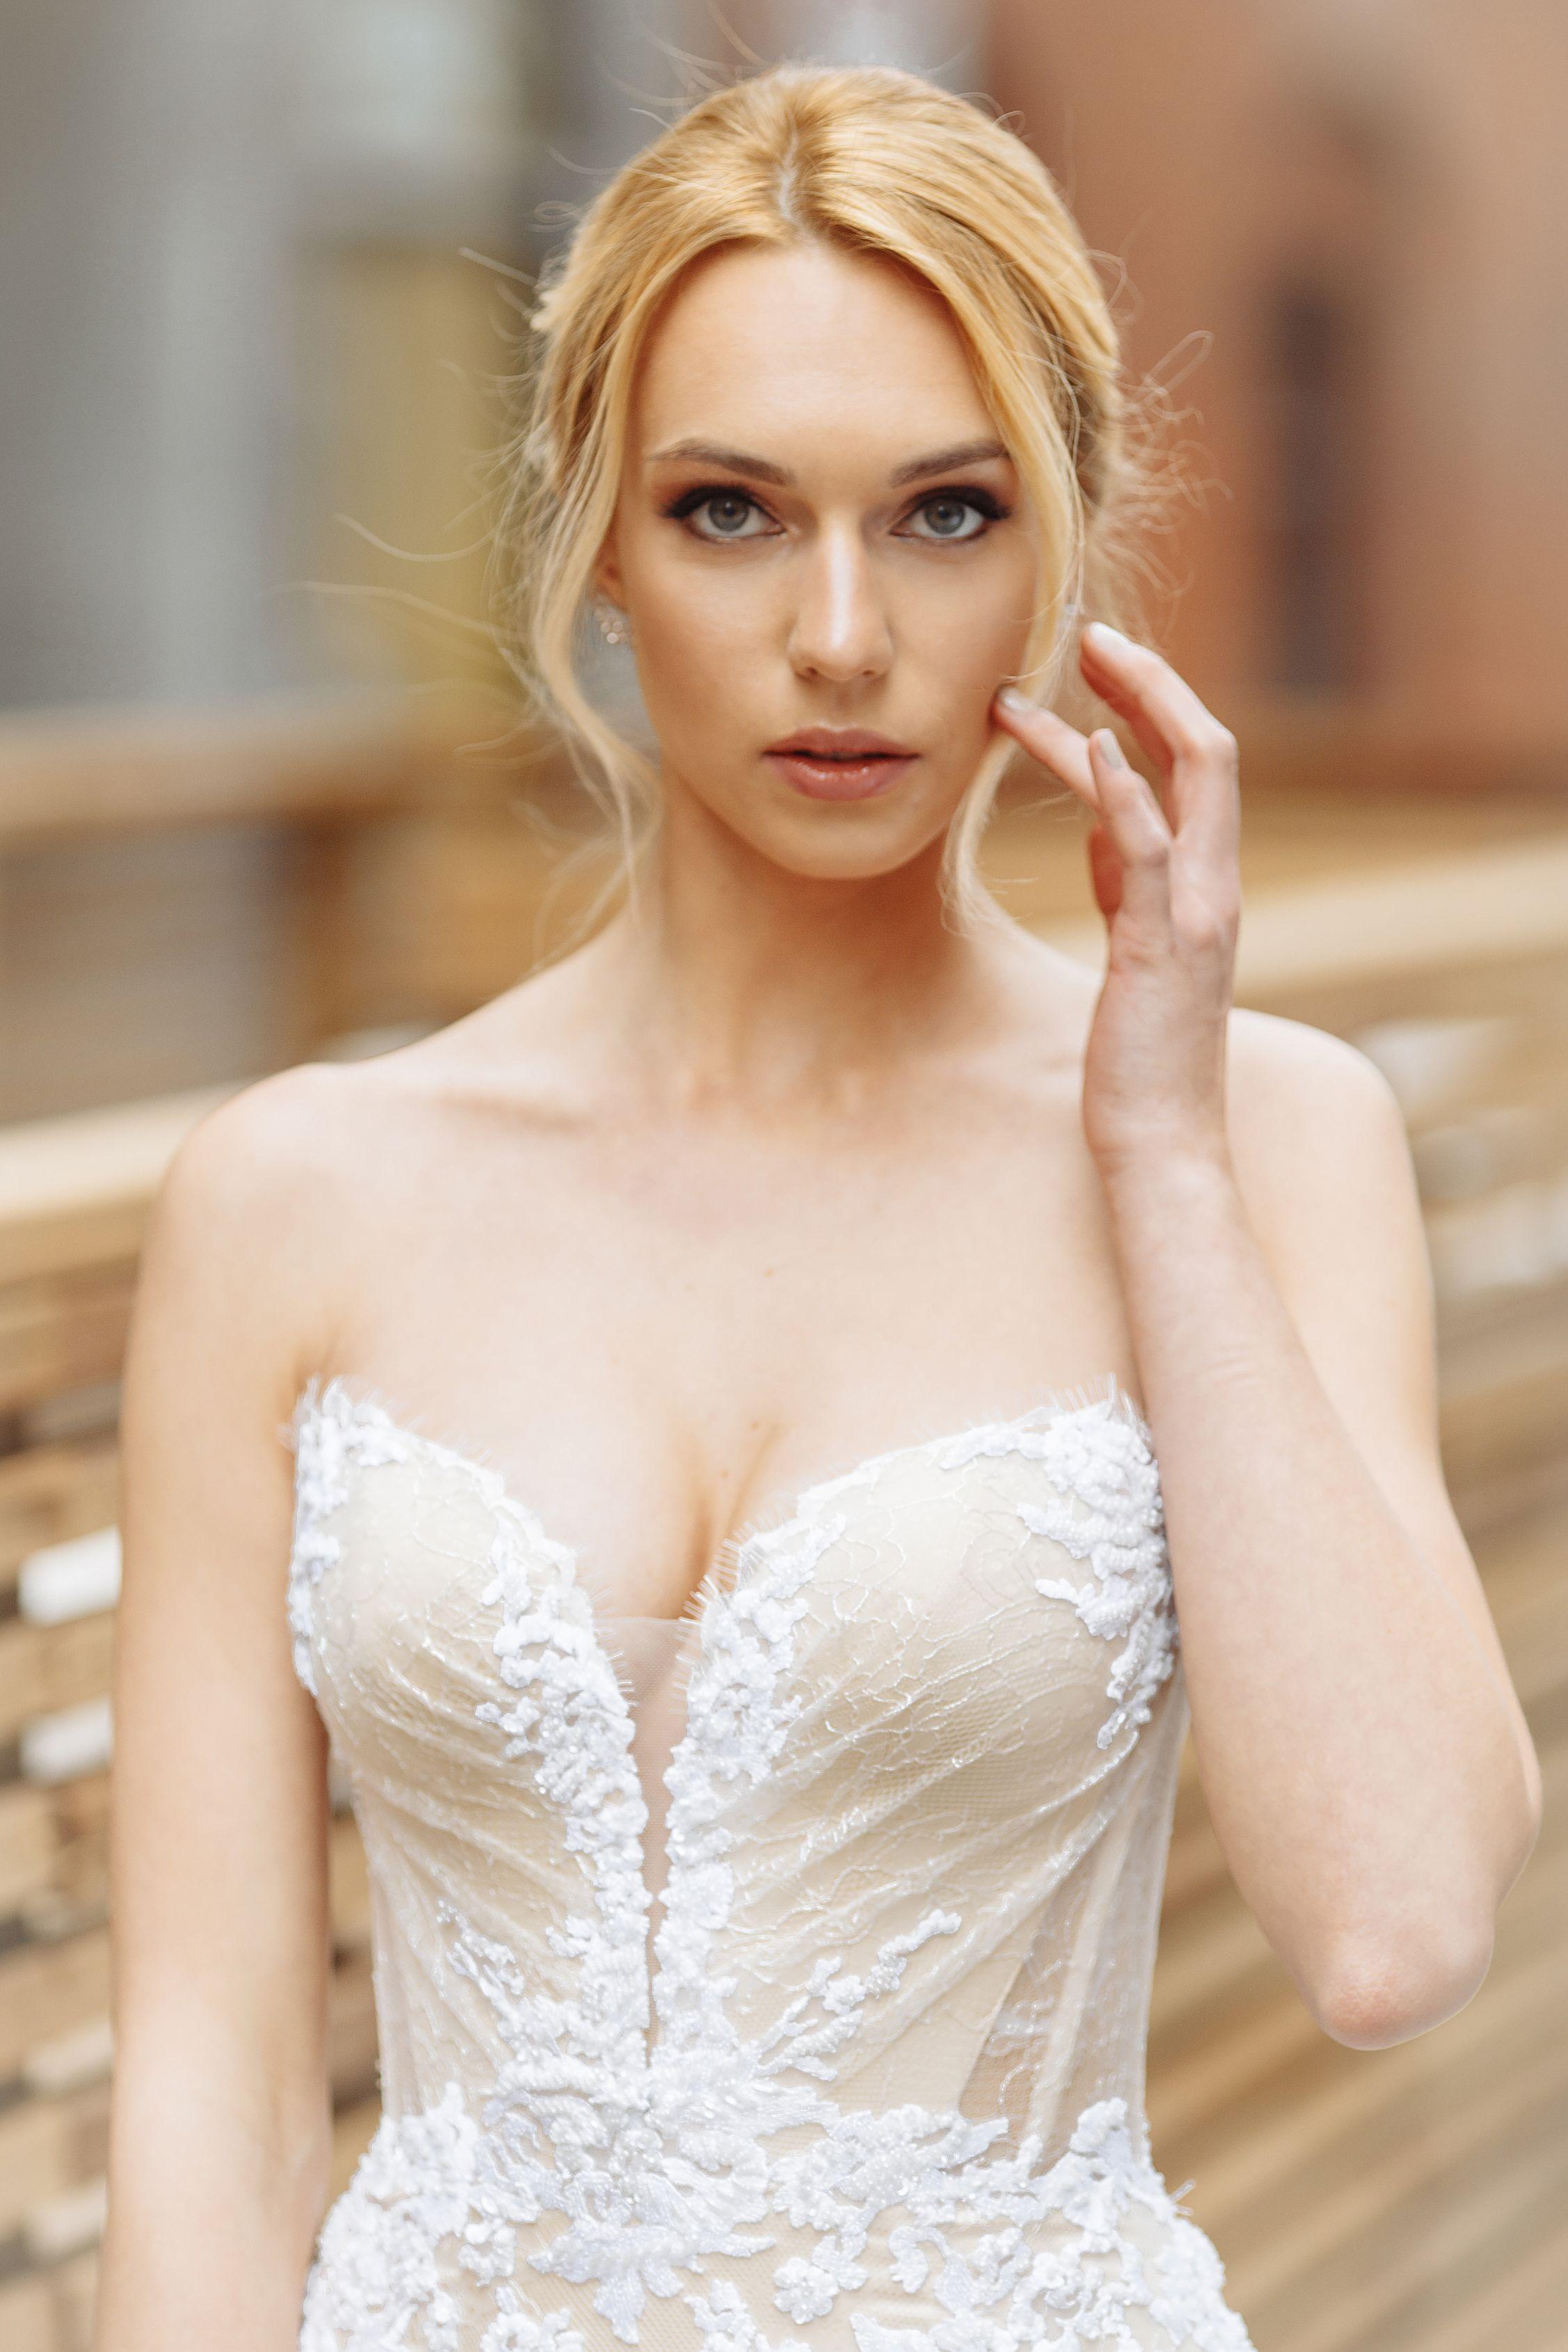 lilia haute couture wedding dresses silk dress see through bustier